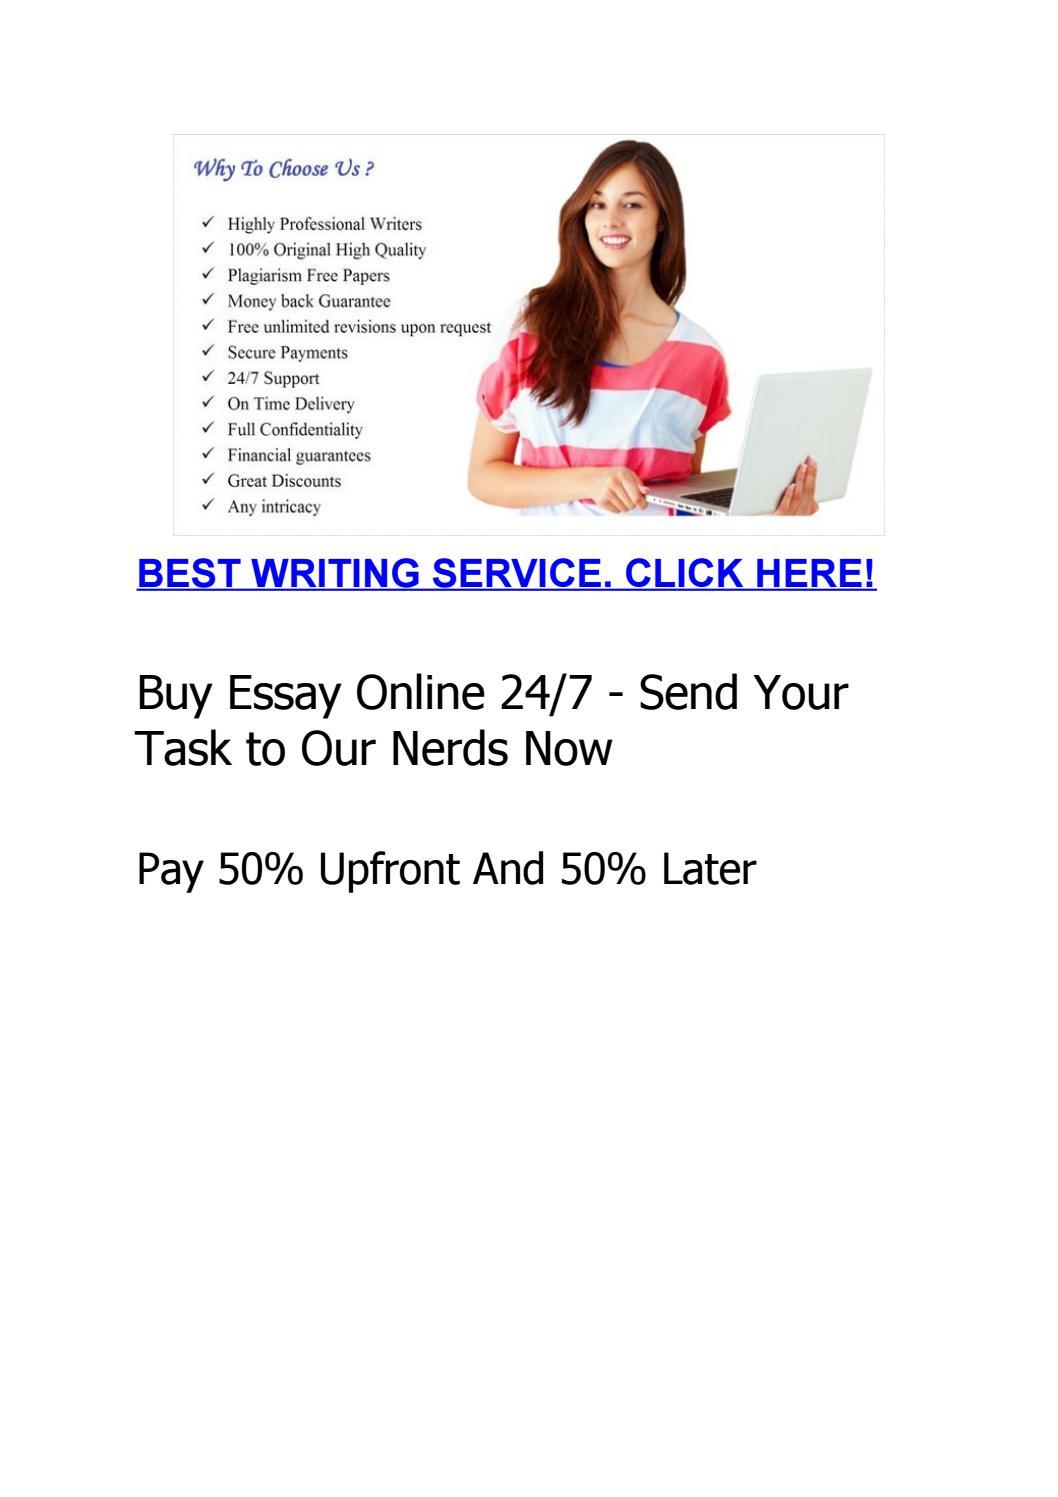 Top cheap essay editing website online